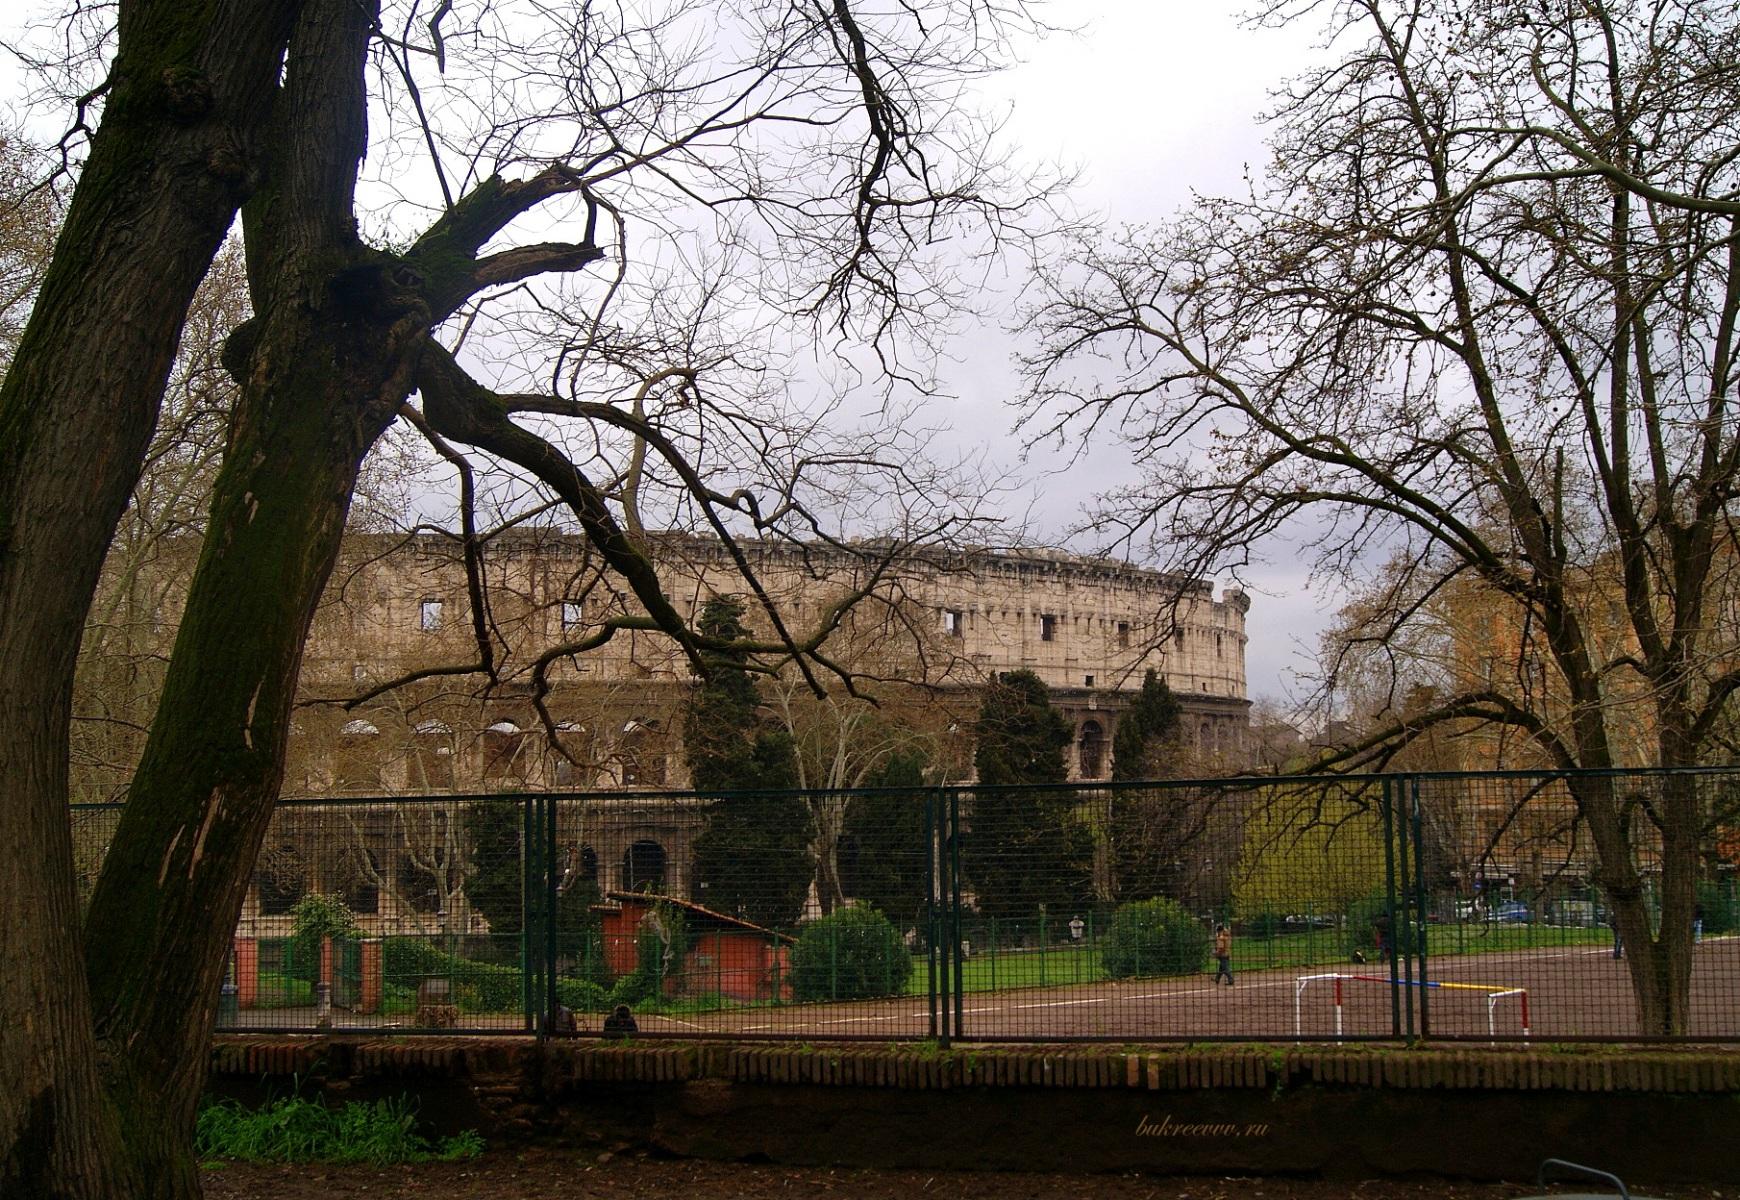 Colosseo 72